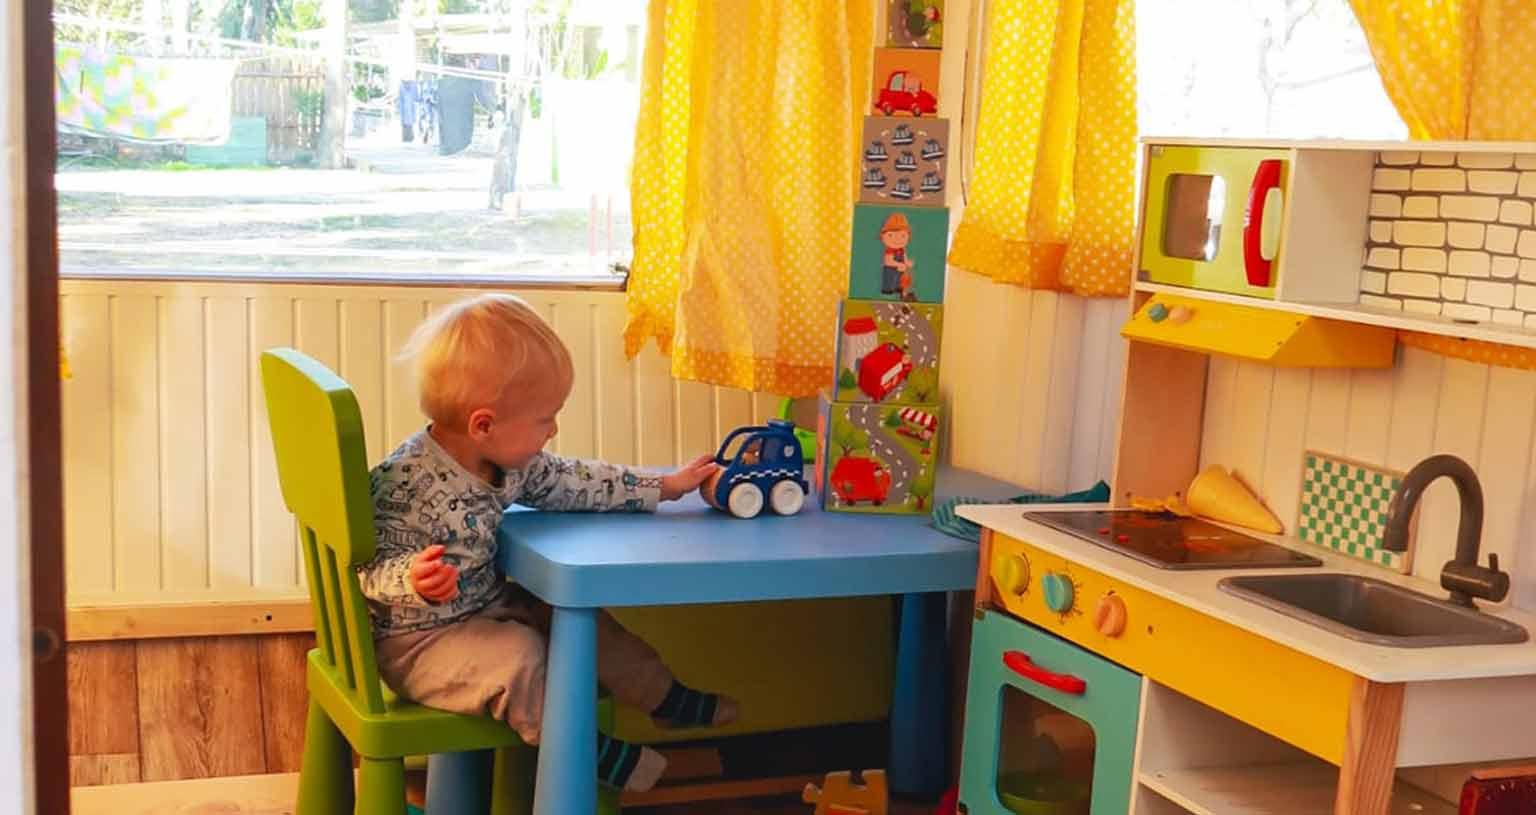 hibisbus peace love om van-wohnwagen kinderzimmer lt vw